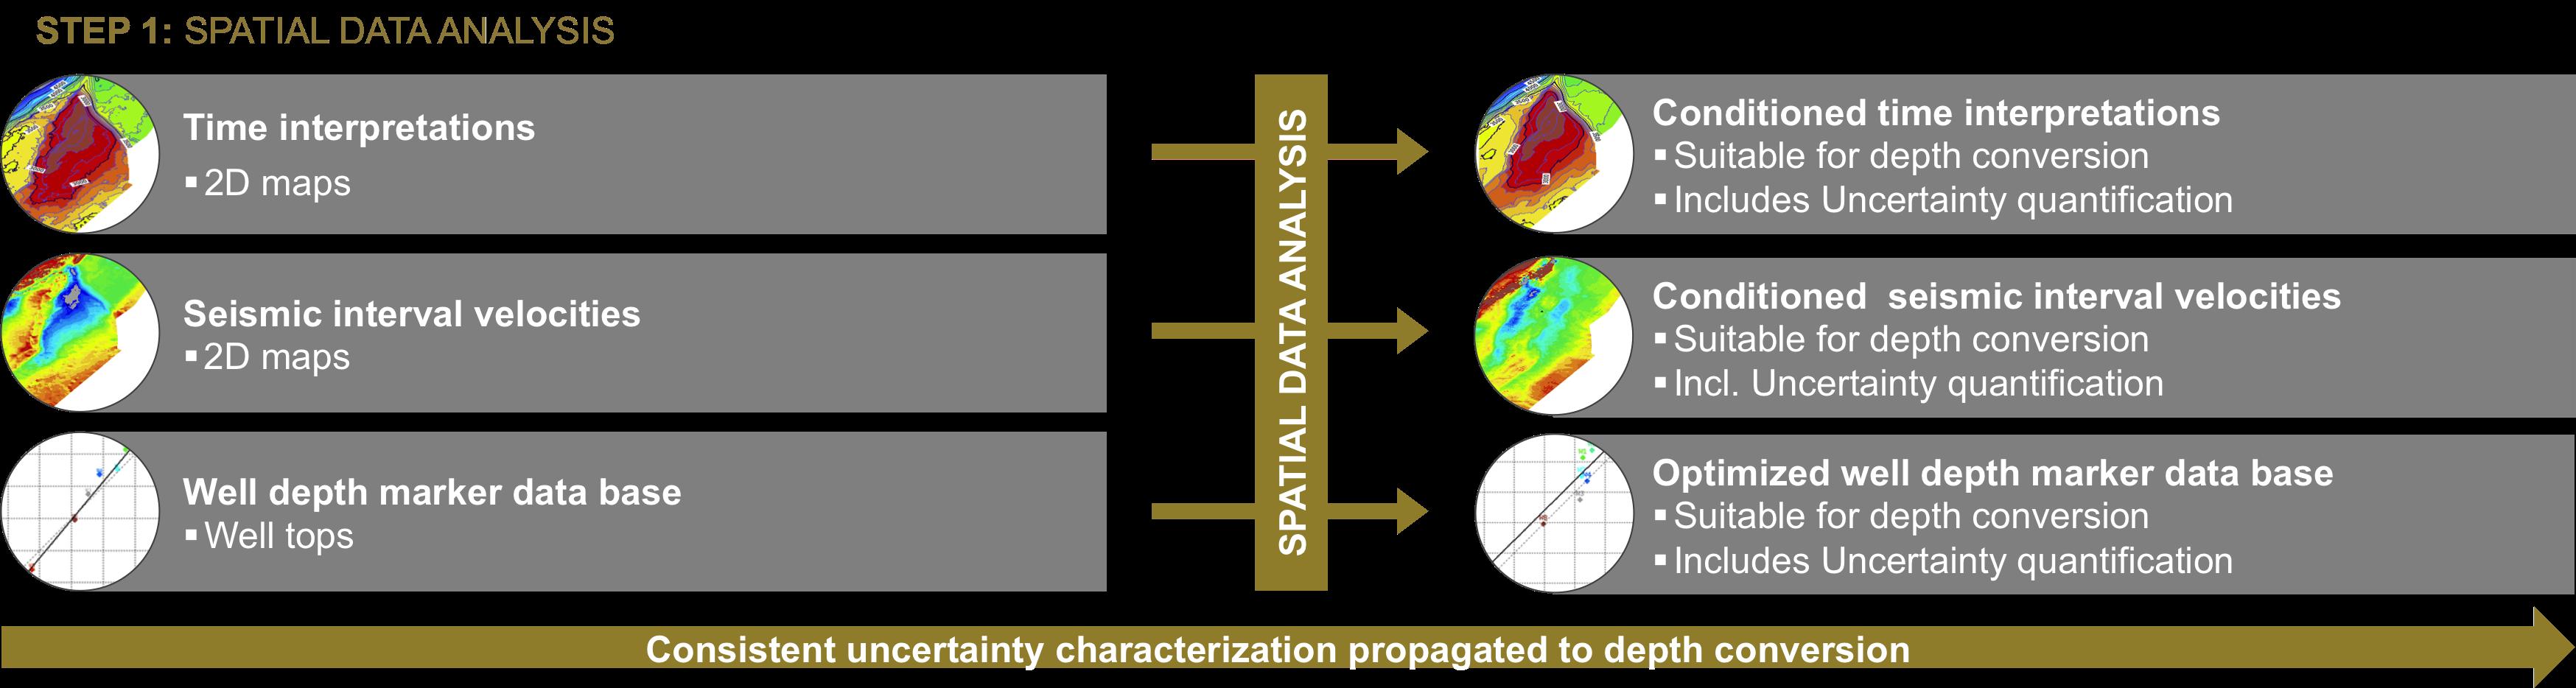 Step 1: Spacial Data Analysis